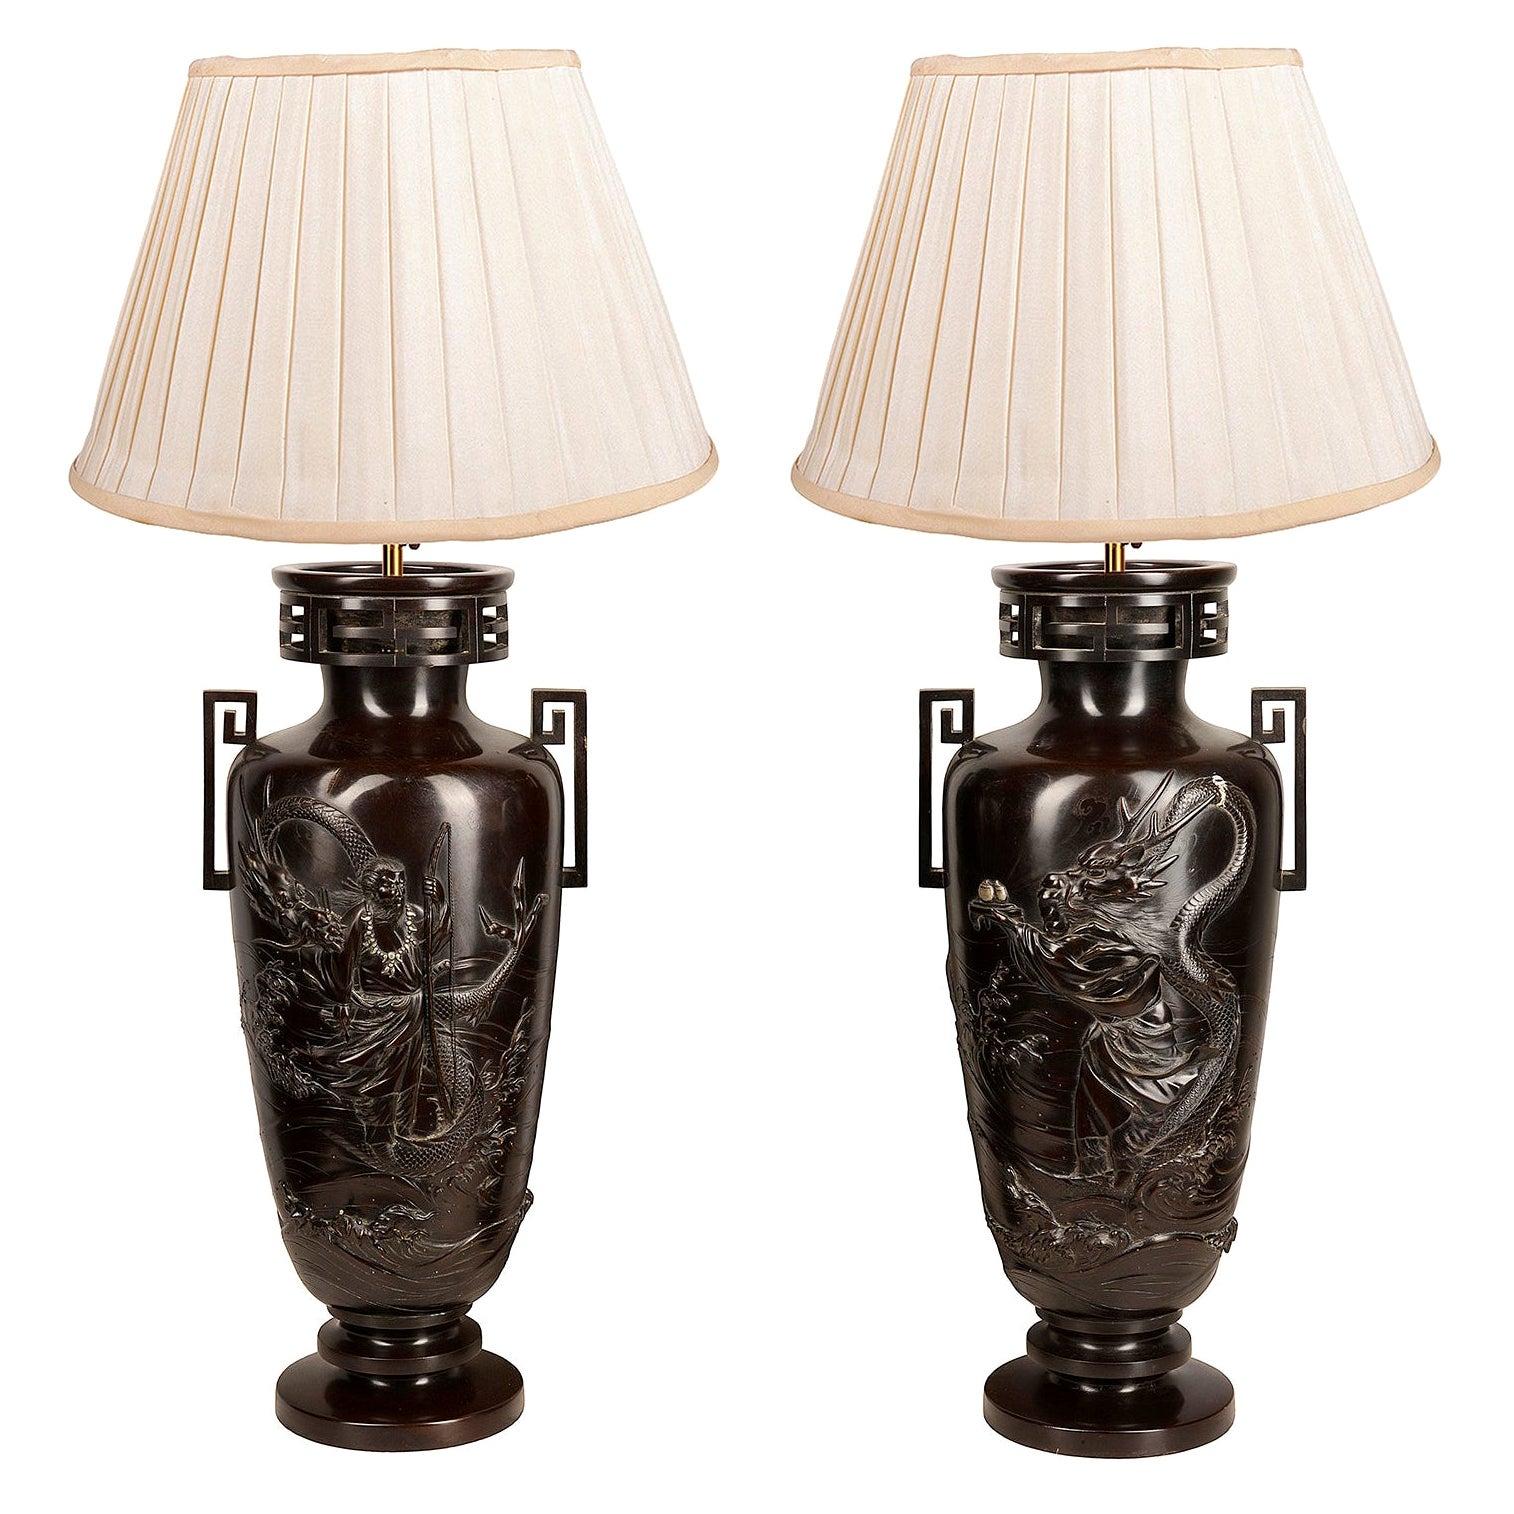 Pair of Japanese Meiji / Taisho Period '1900-1920' Cast Bronze Vases / Lamps